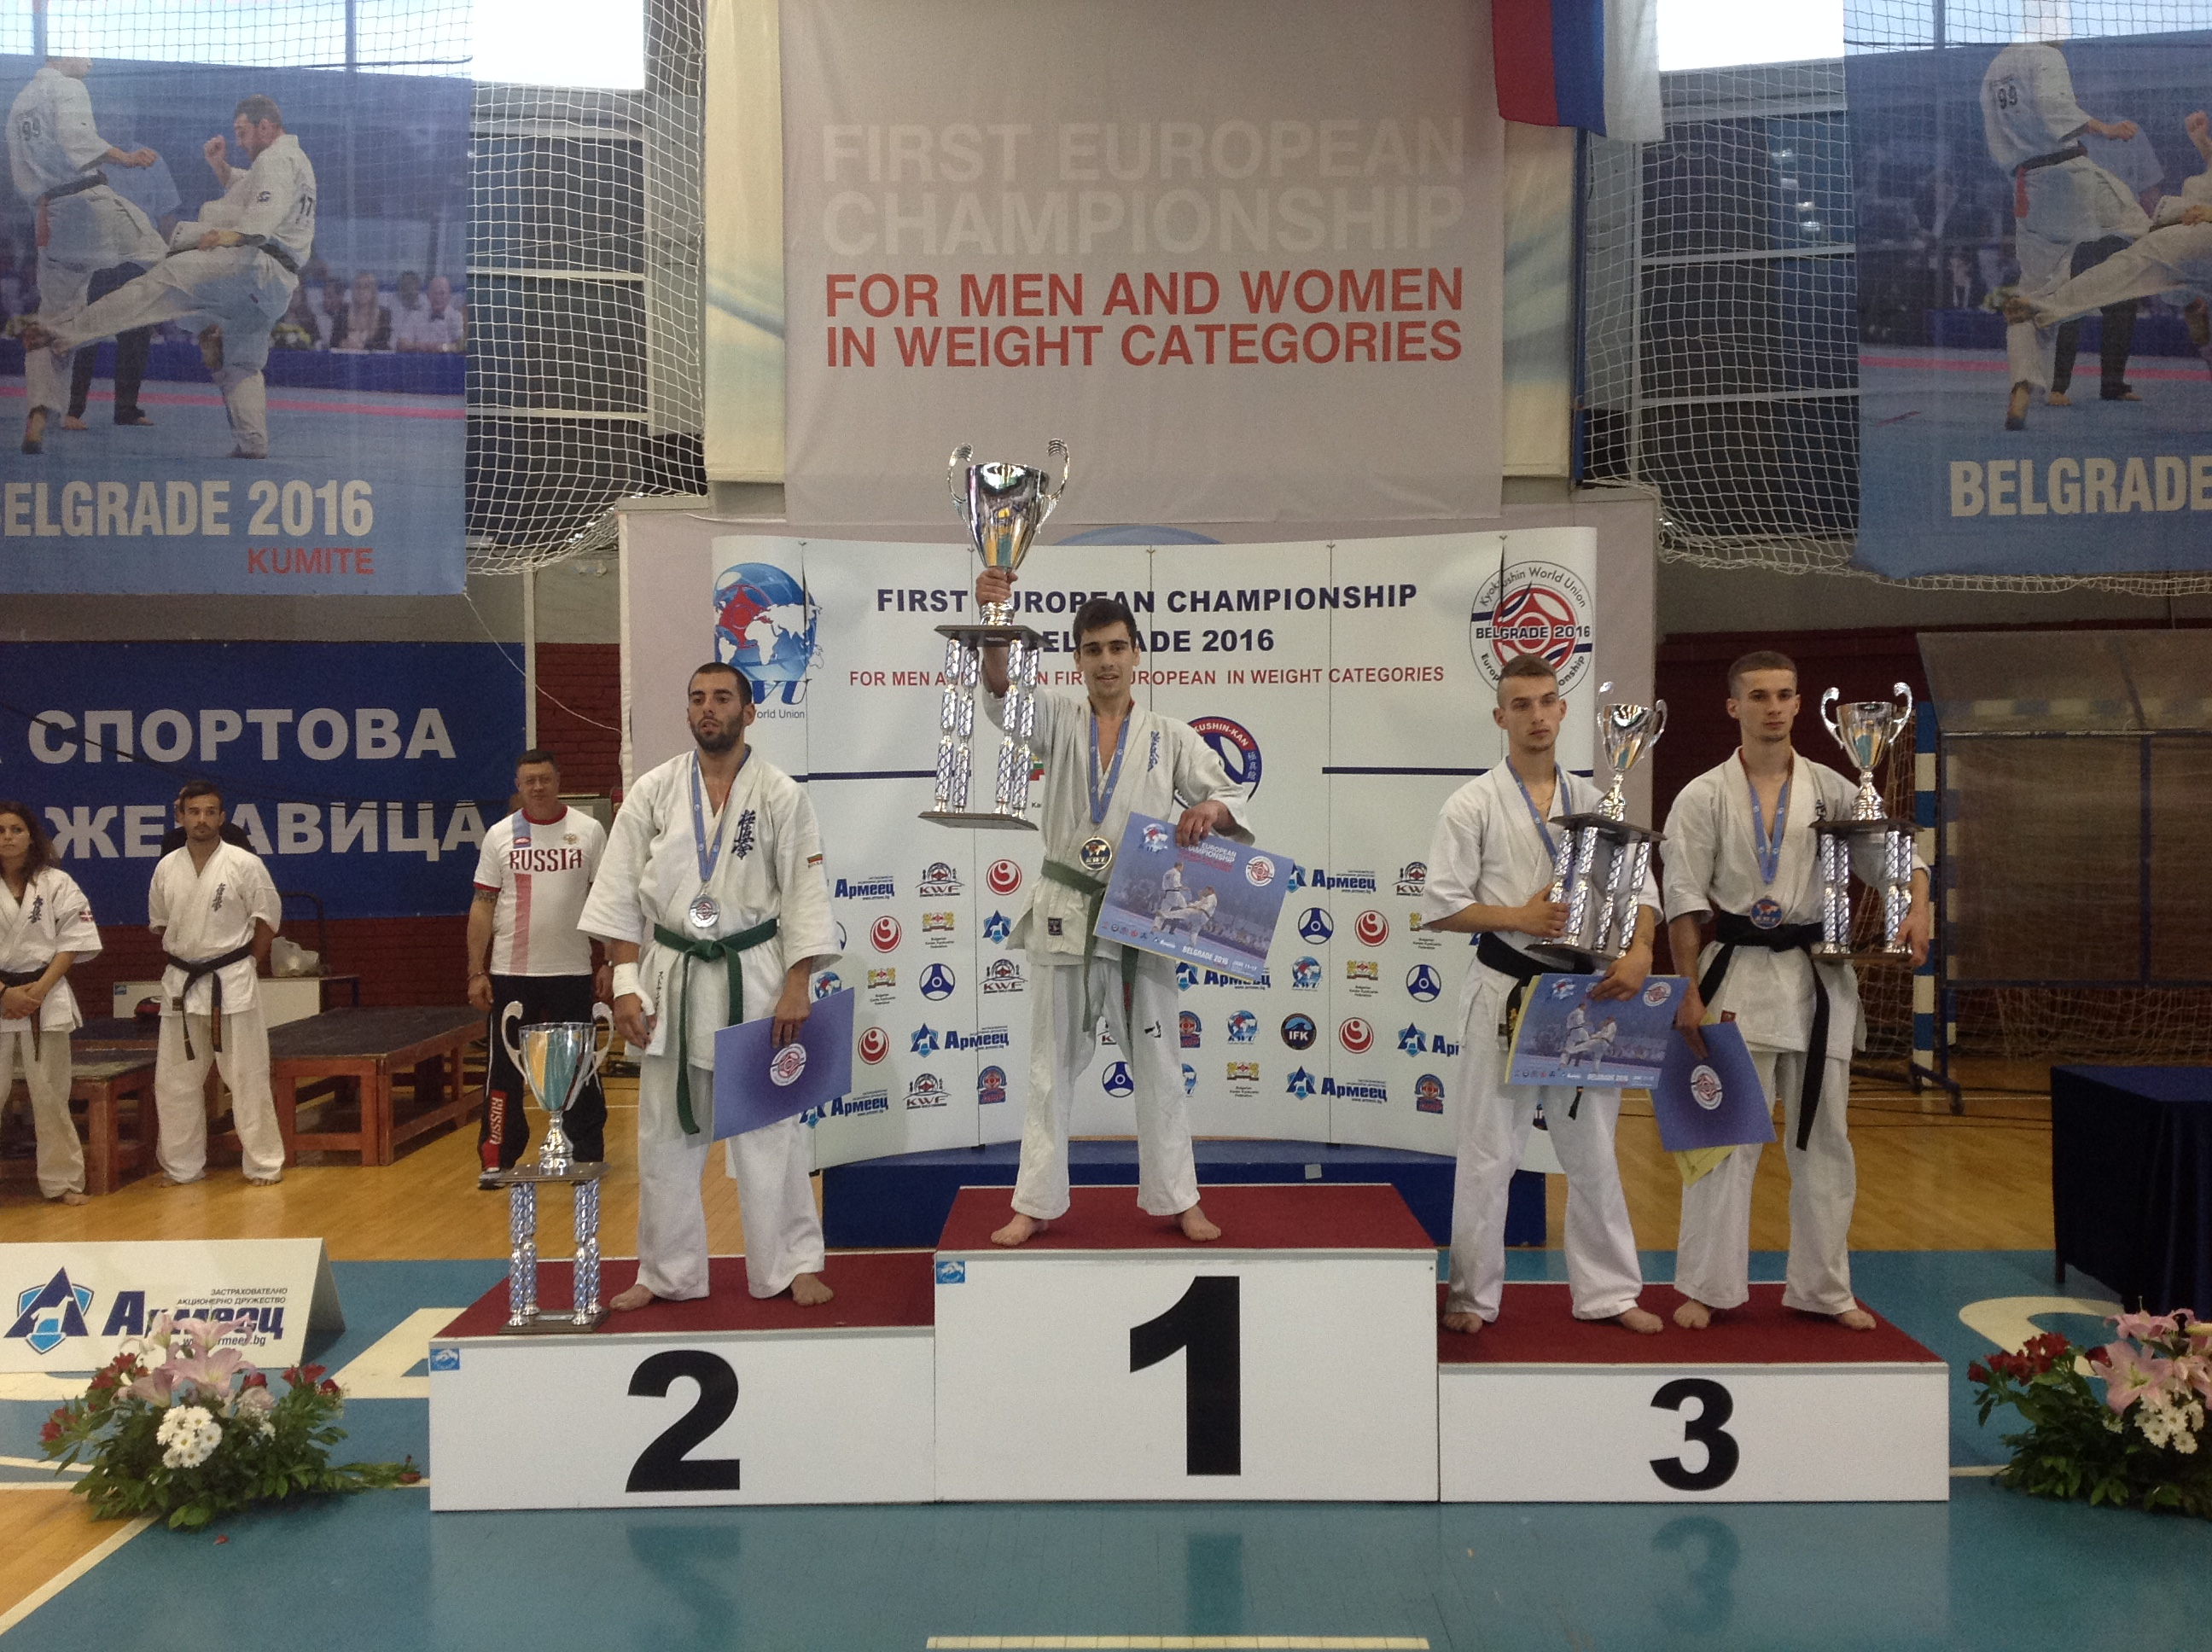 Серго Арменян - участник WFKO Grand-Prix Kyokushinkai / Bulgaria -2018